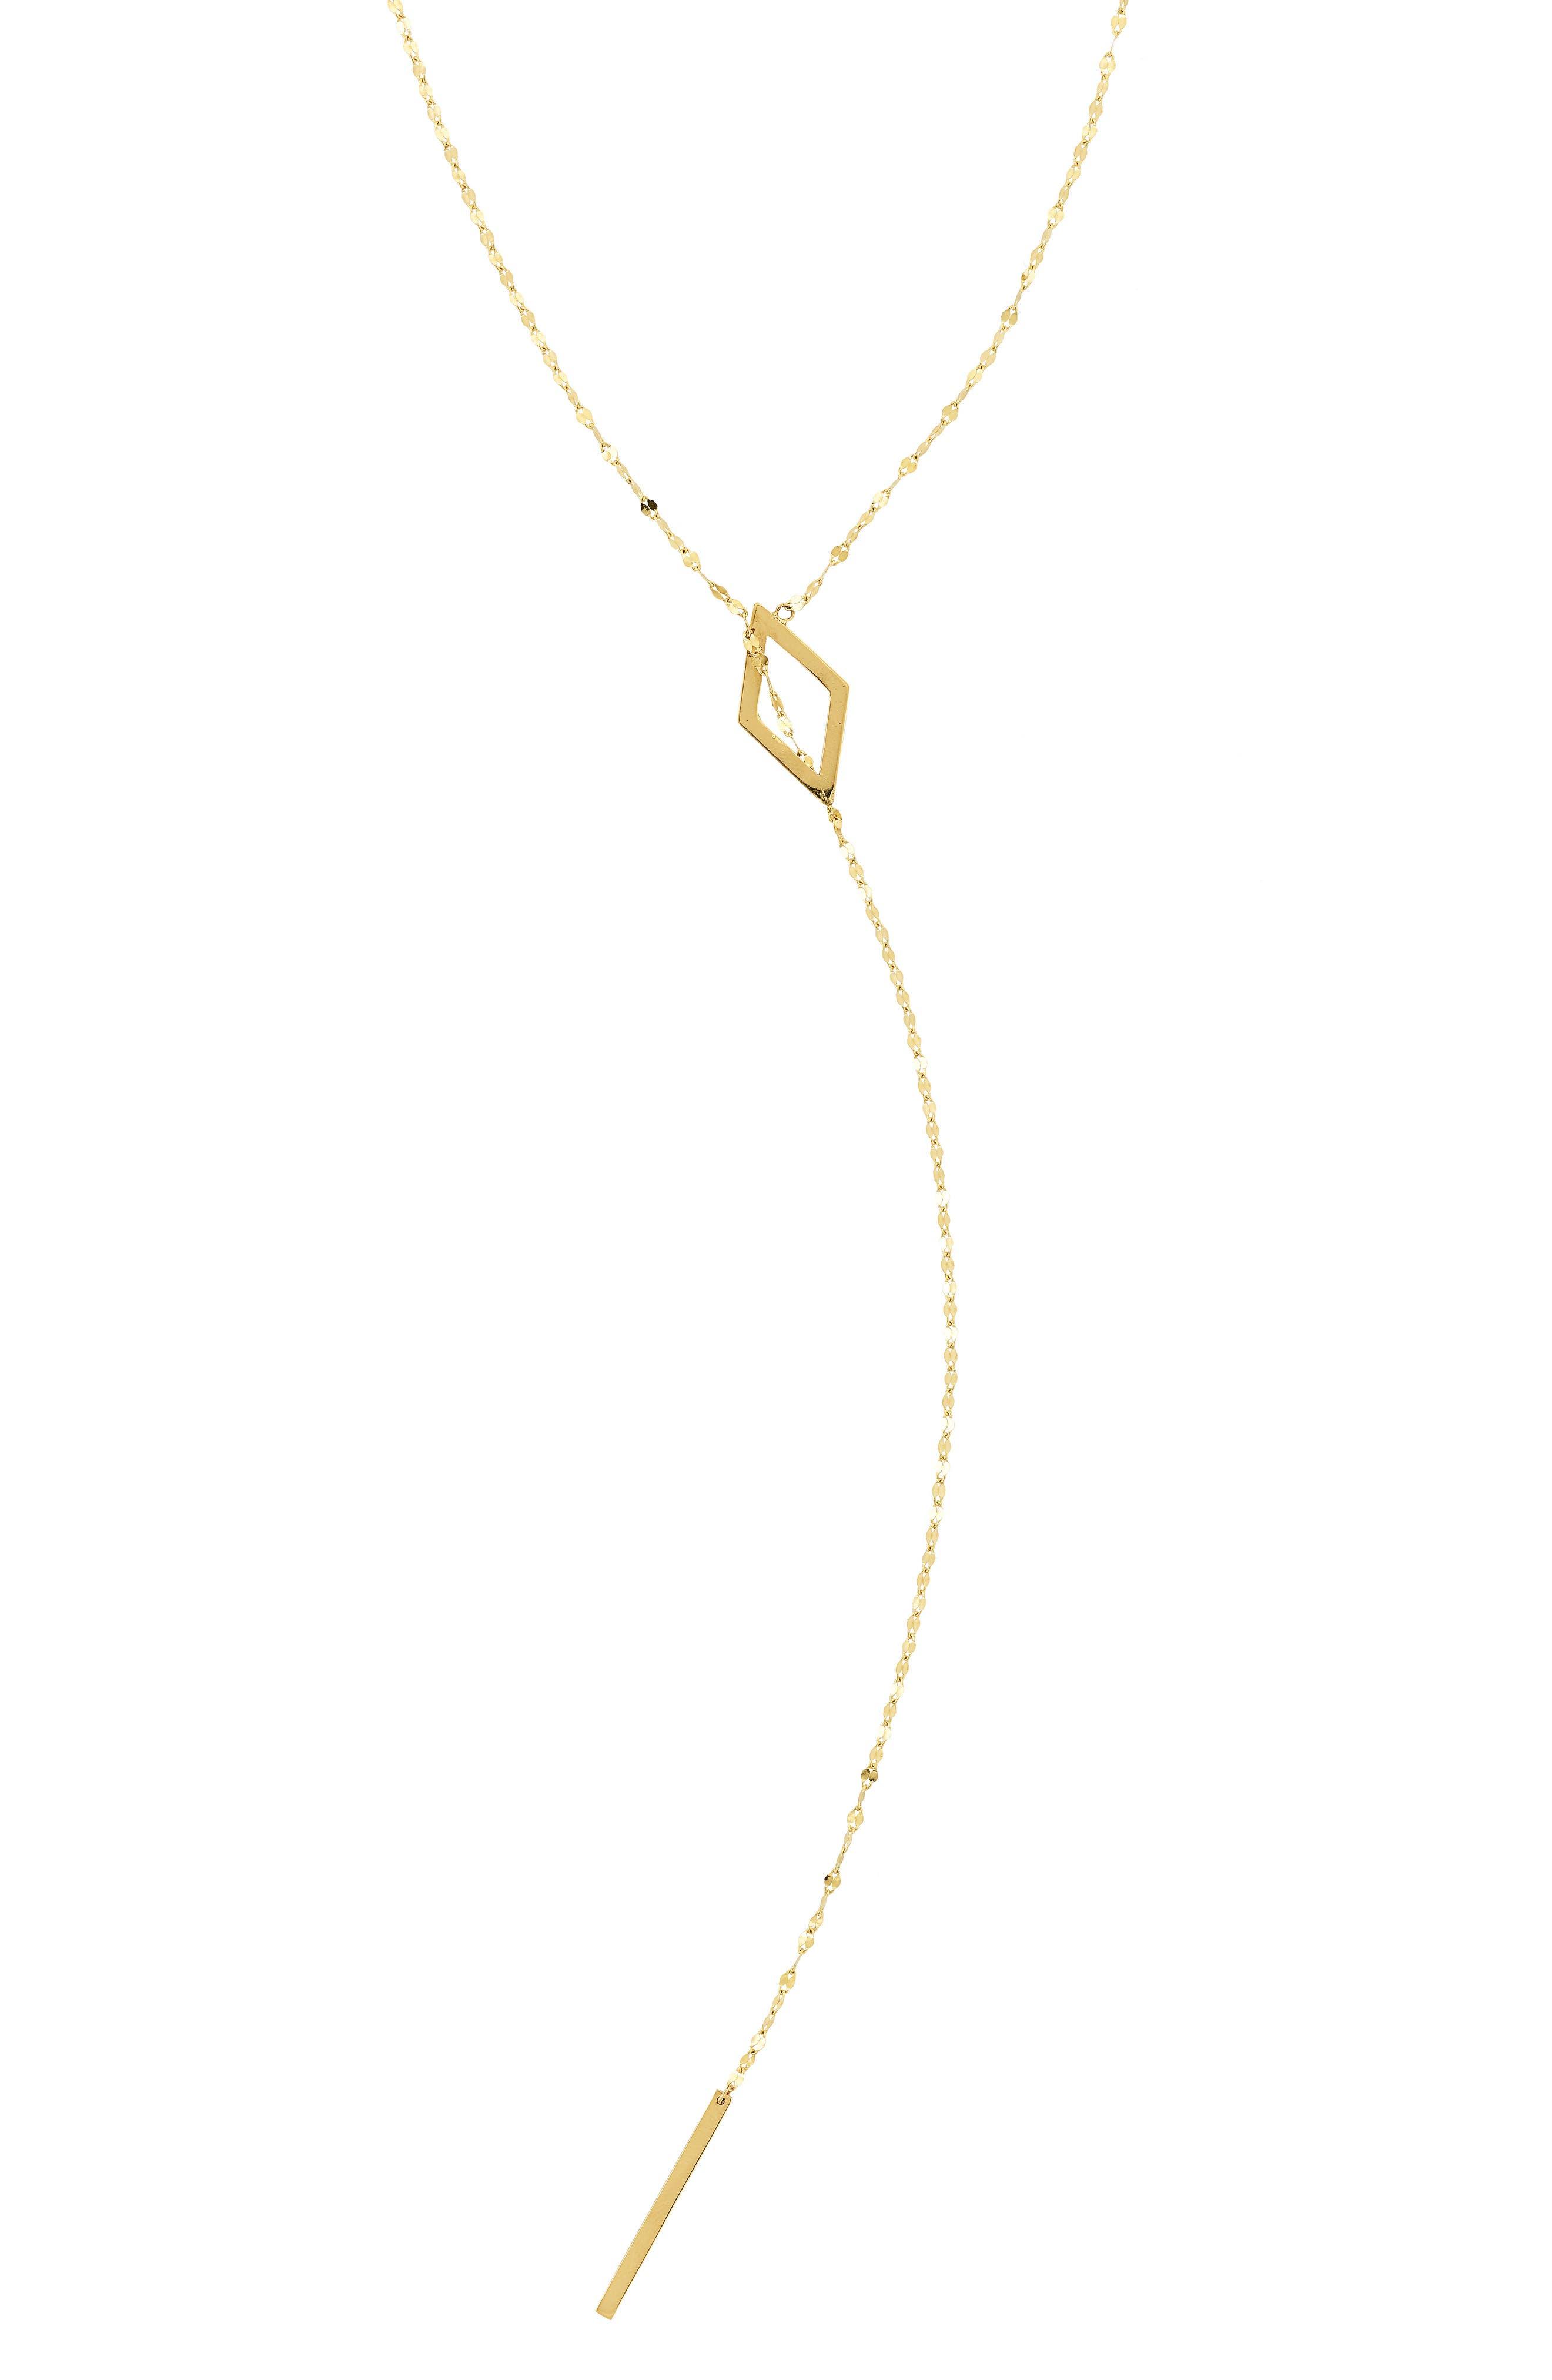 Main Image - Lana Jewelry Lariat Necklace